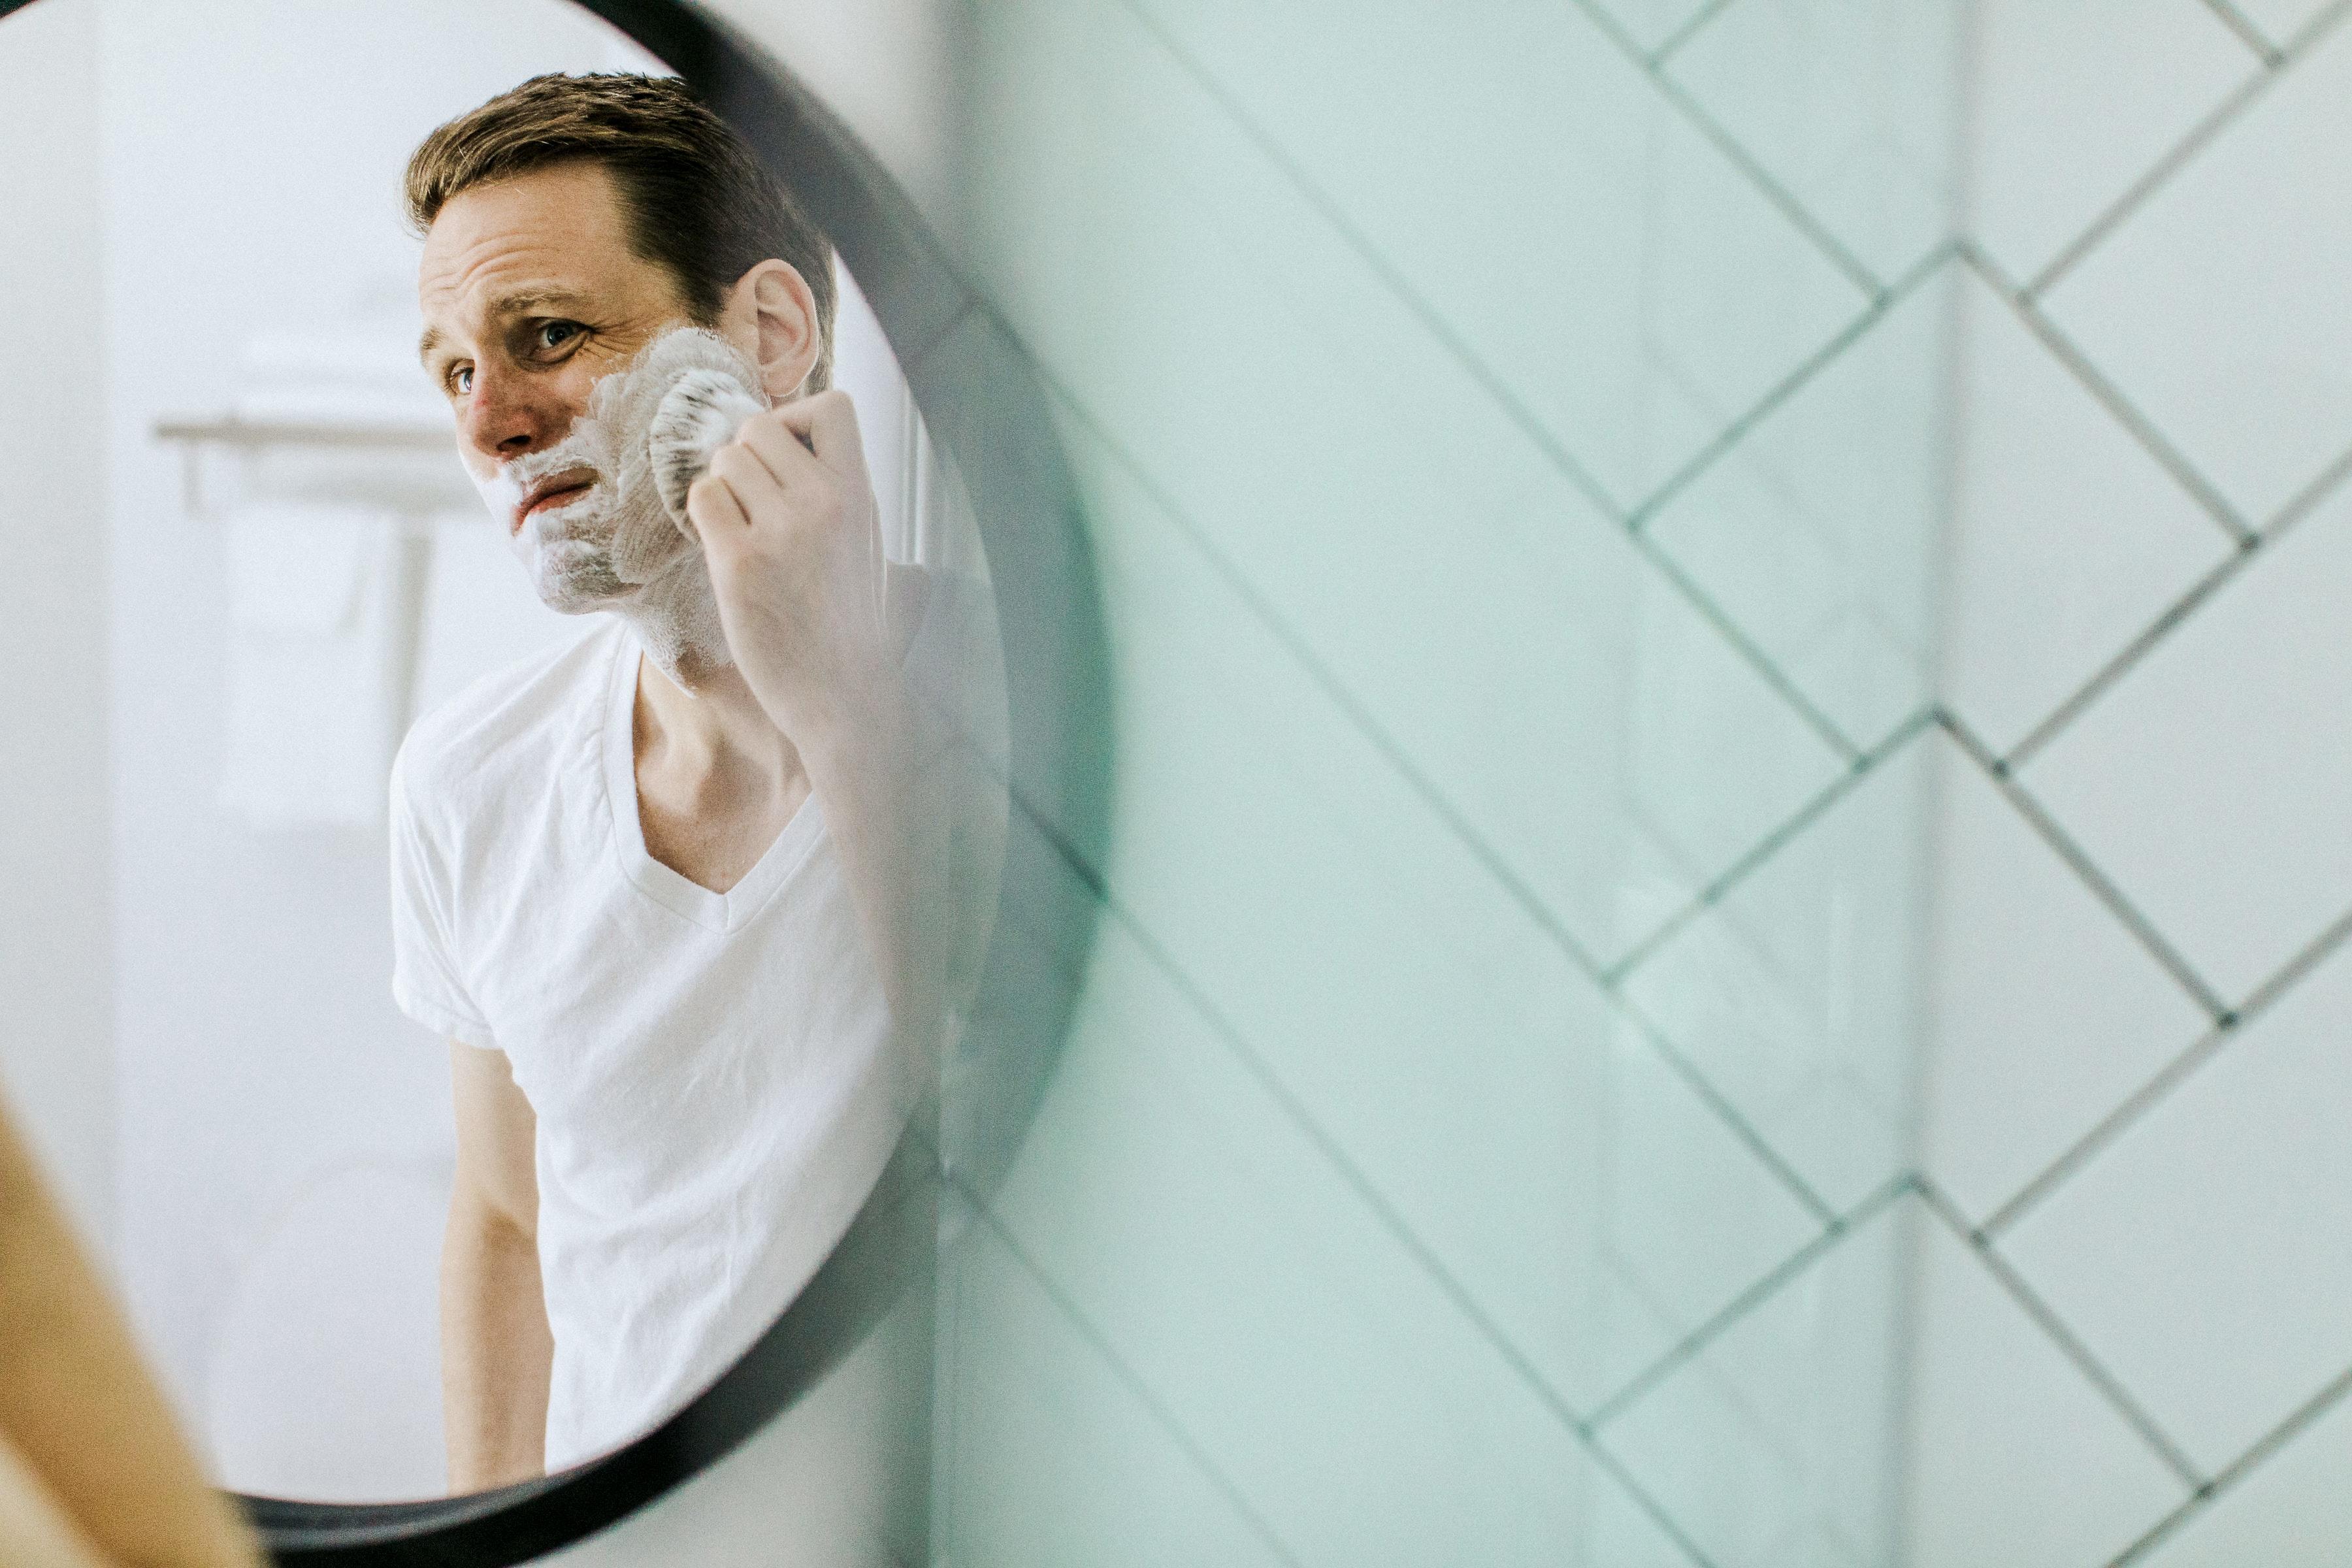 How men take longer grooming nowadays